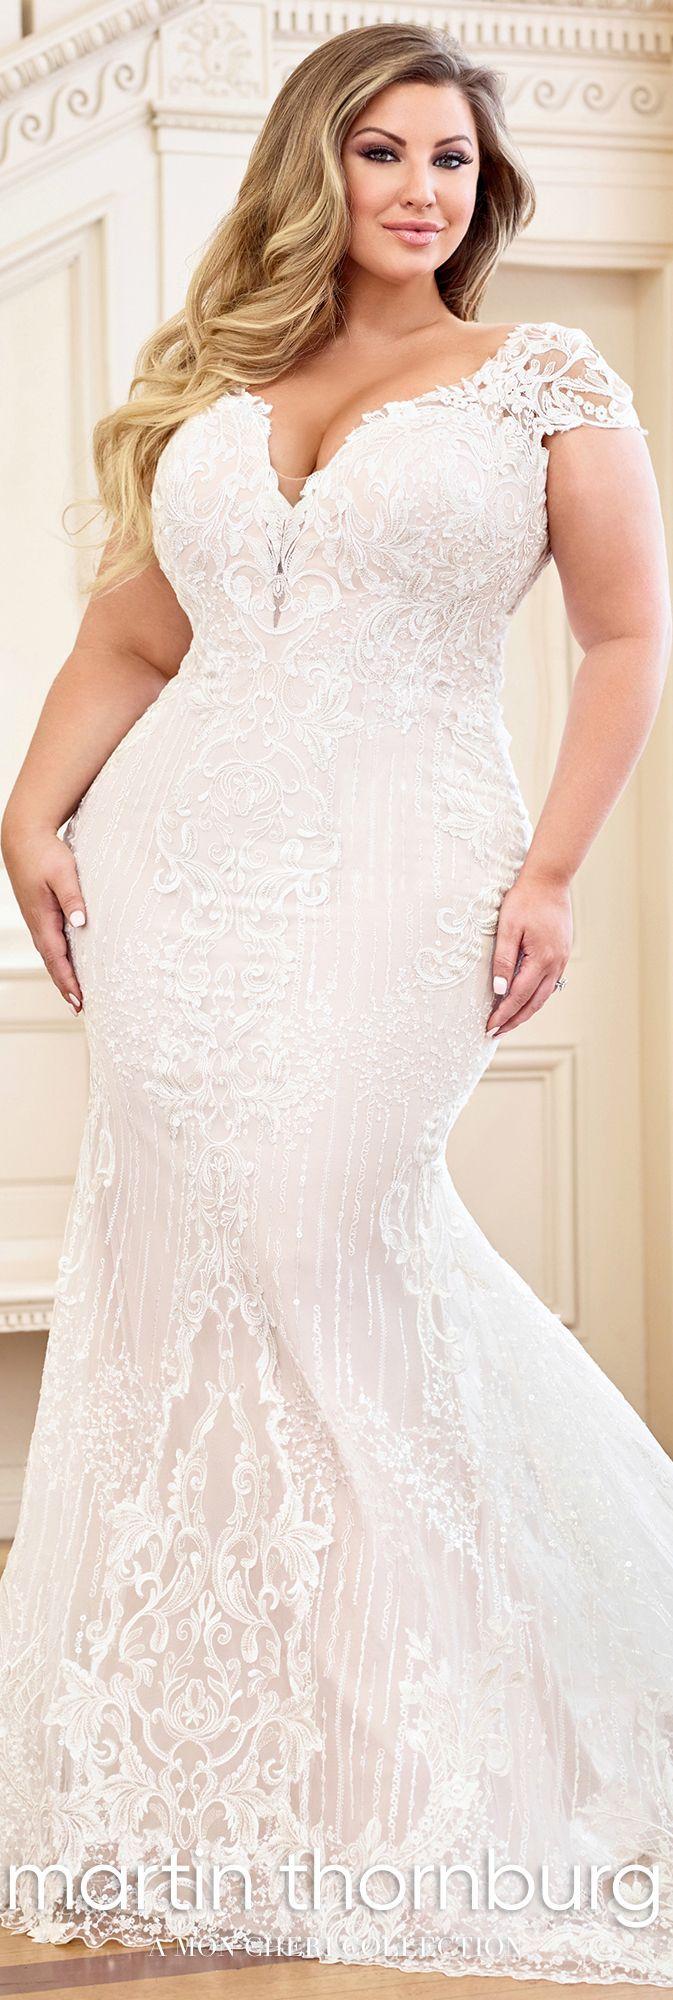 Martin Thornburg 119269w Martha Fit And Flare Wedding Dress Fitted Wedding Dress Wedding Dresses Unique [ 2000 x 673 Pixel ]